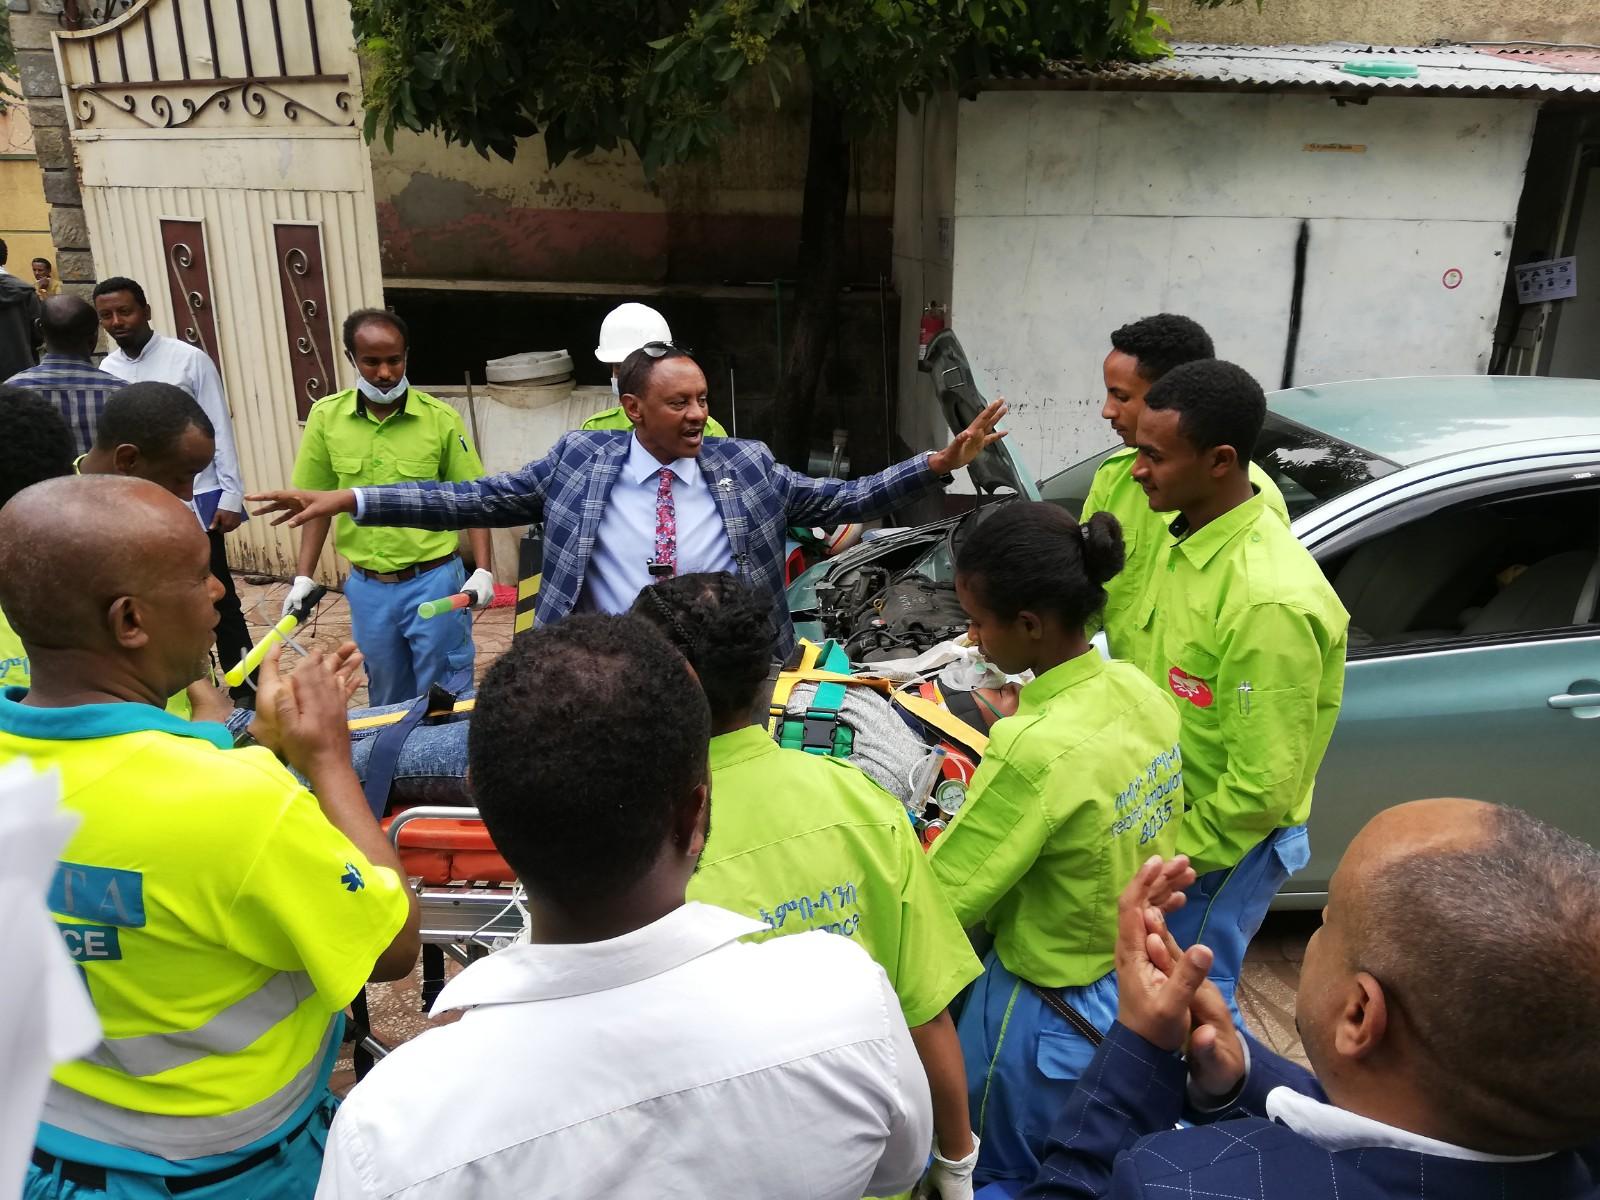 Tebita Ambulance Kibret and students